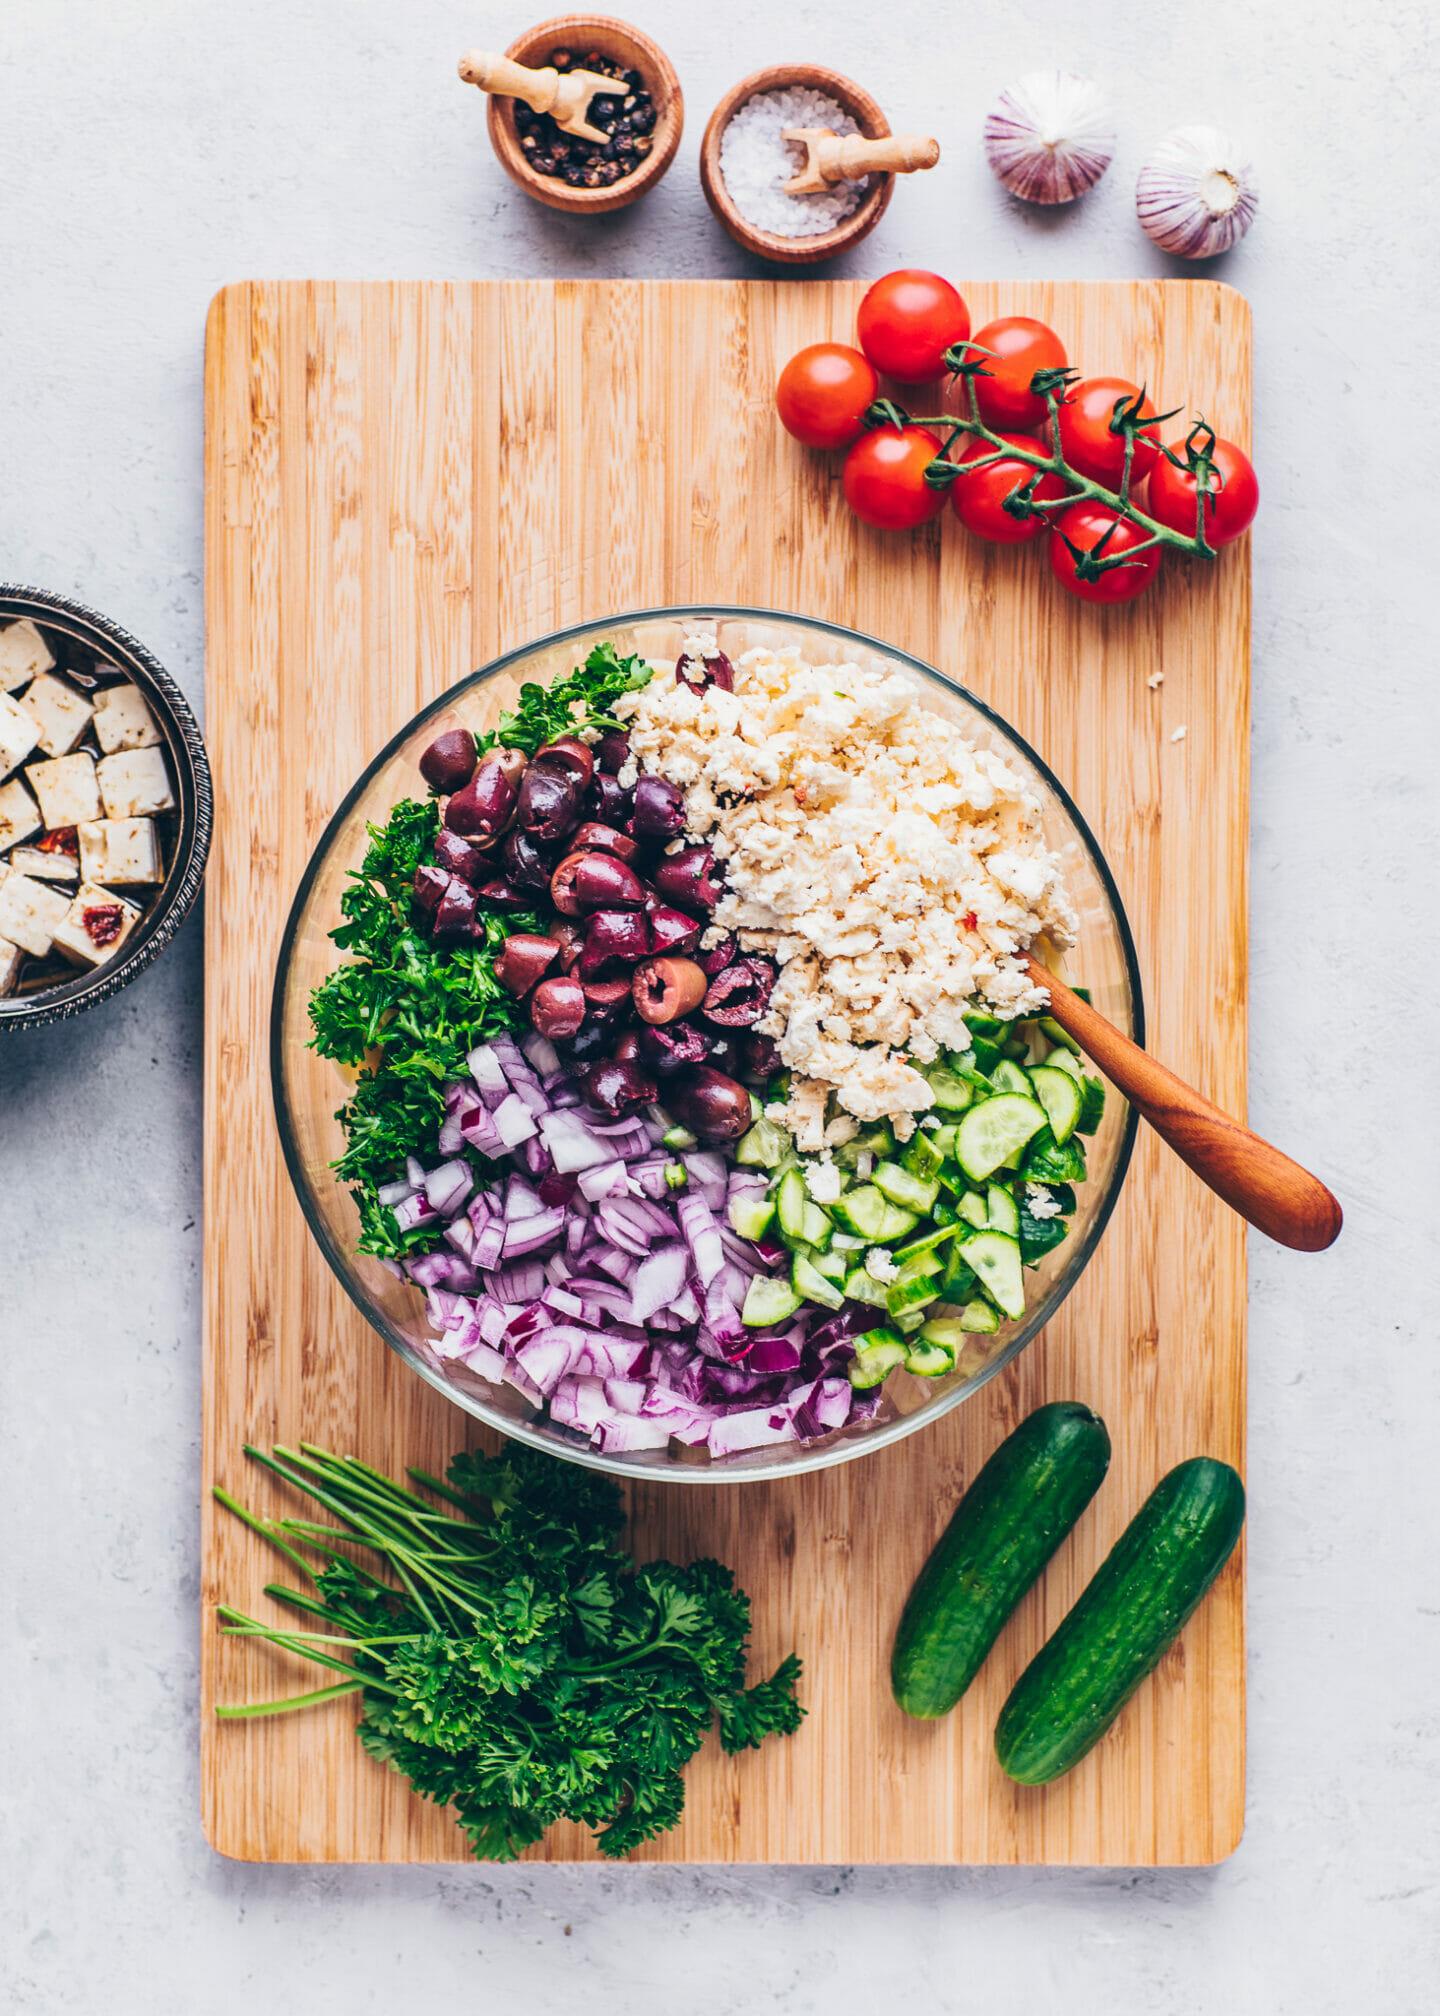 orzo pasta, kalamata oliven, cucumber, tomatoes, onion, parsley, lemon for greek salad